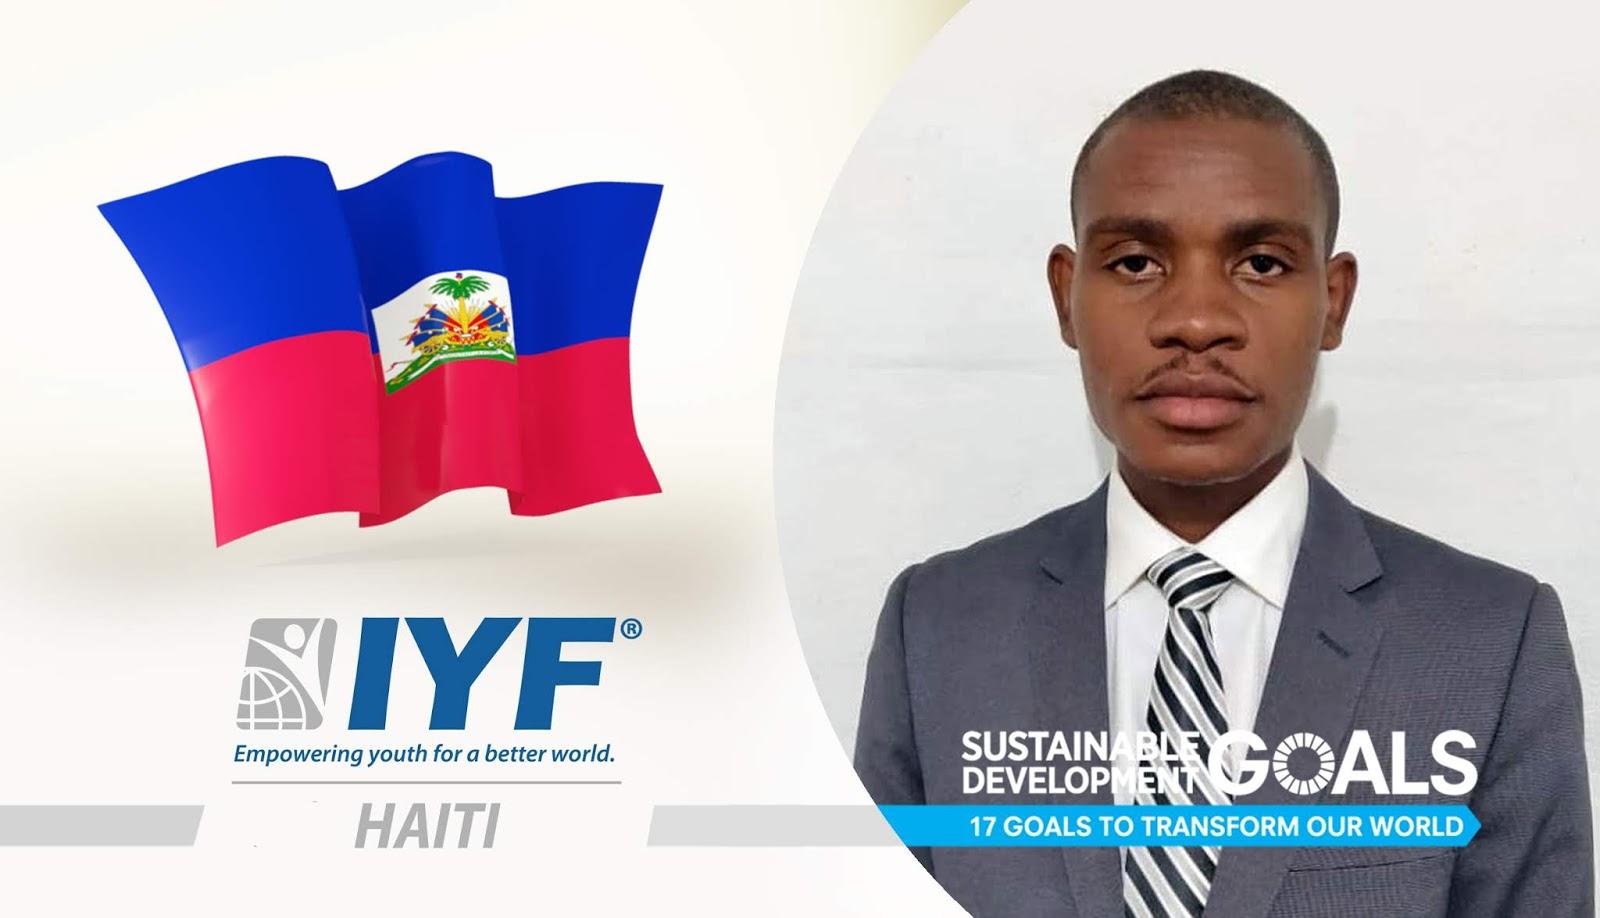 Luidgi Jivens Selvius, IYF Representative in Haiti